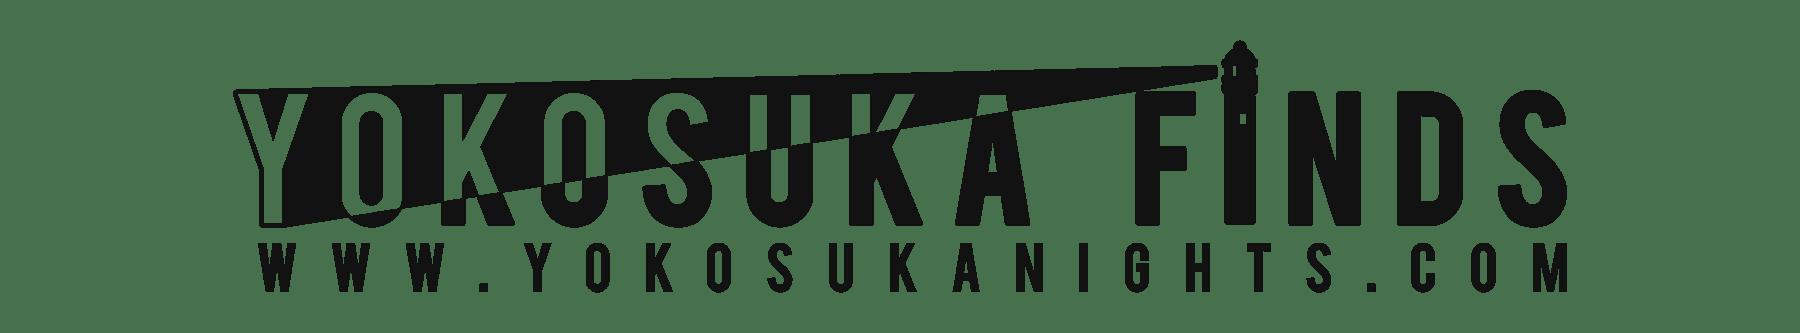 Yokosuka Finds